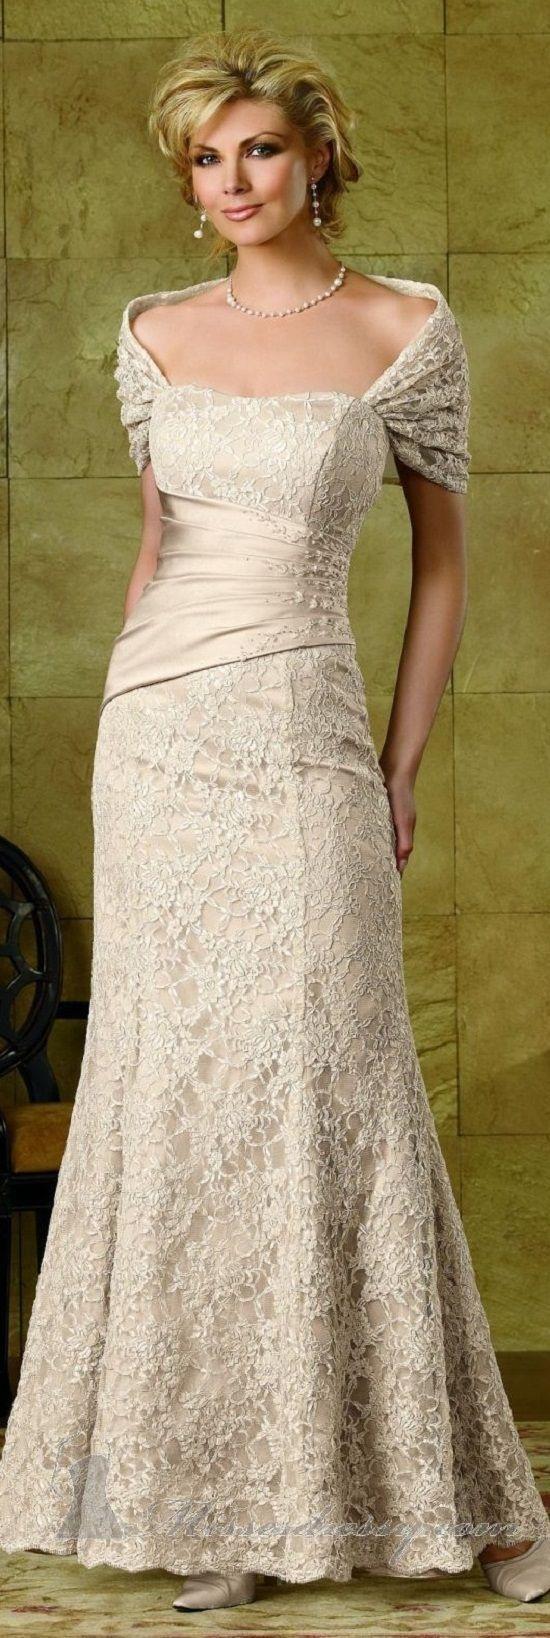 Ivory Wedding Dresses for Older Brides - How to Dress for A Wedding ...